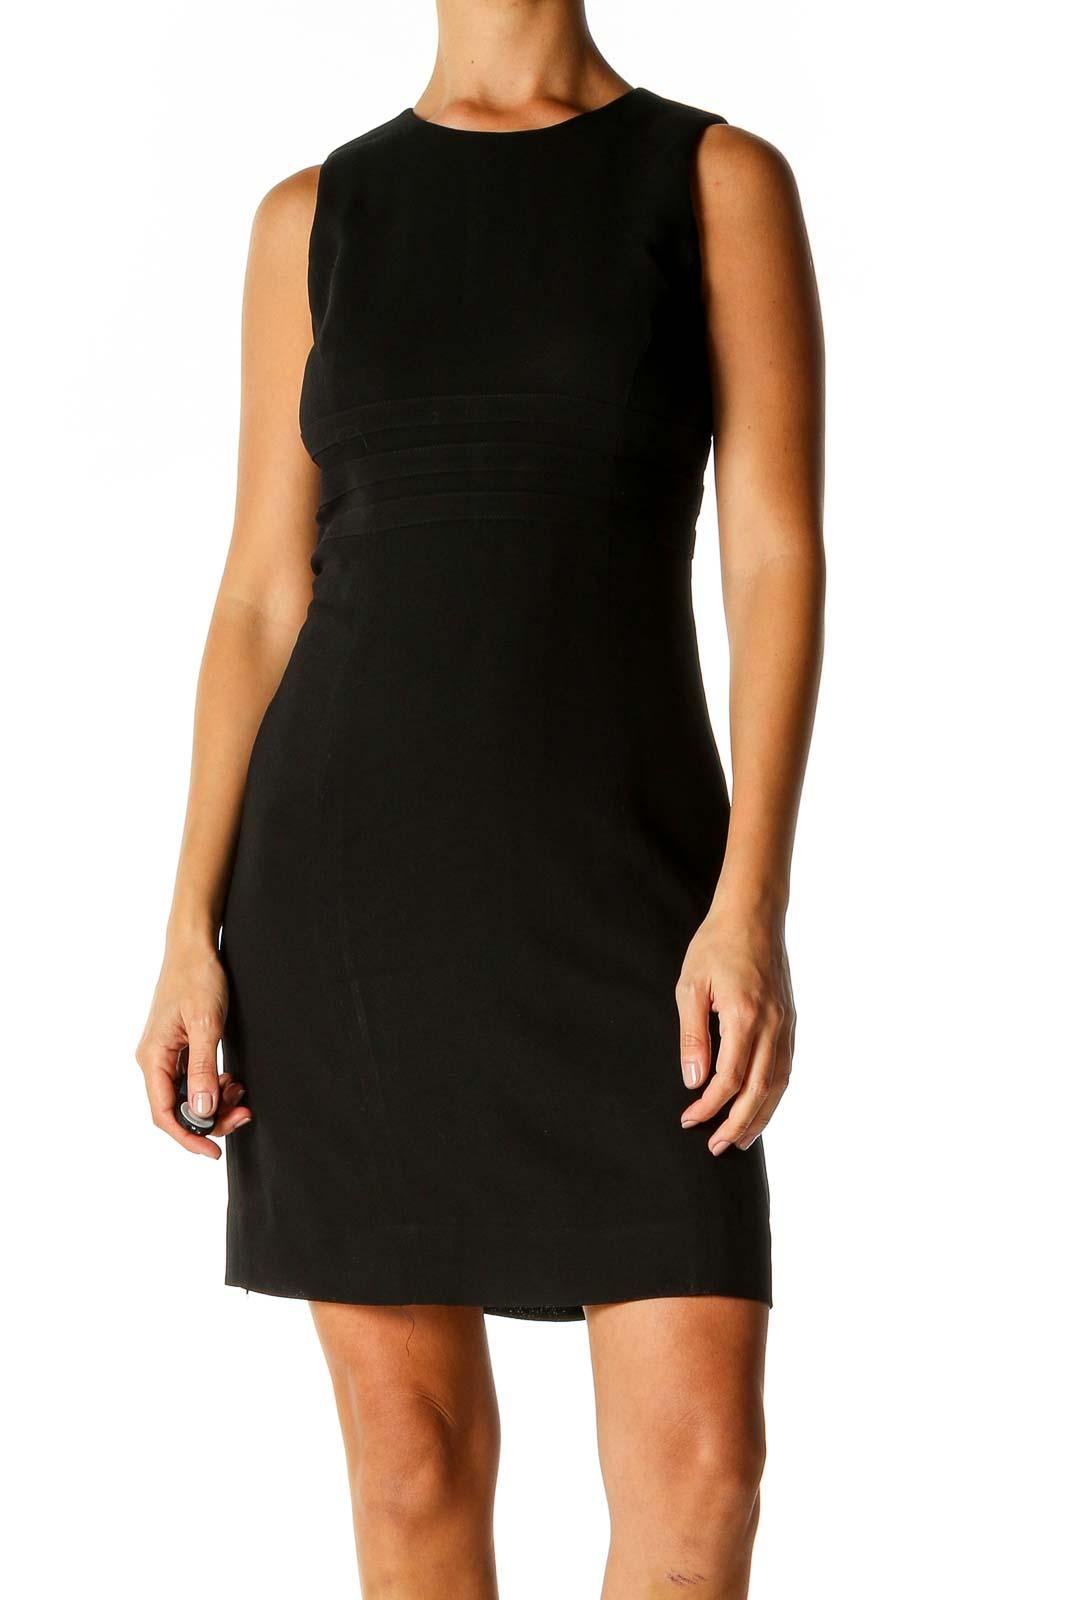 Black Solid Classic Sheath Dress Front